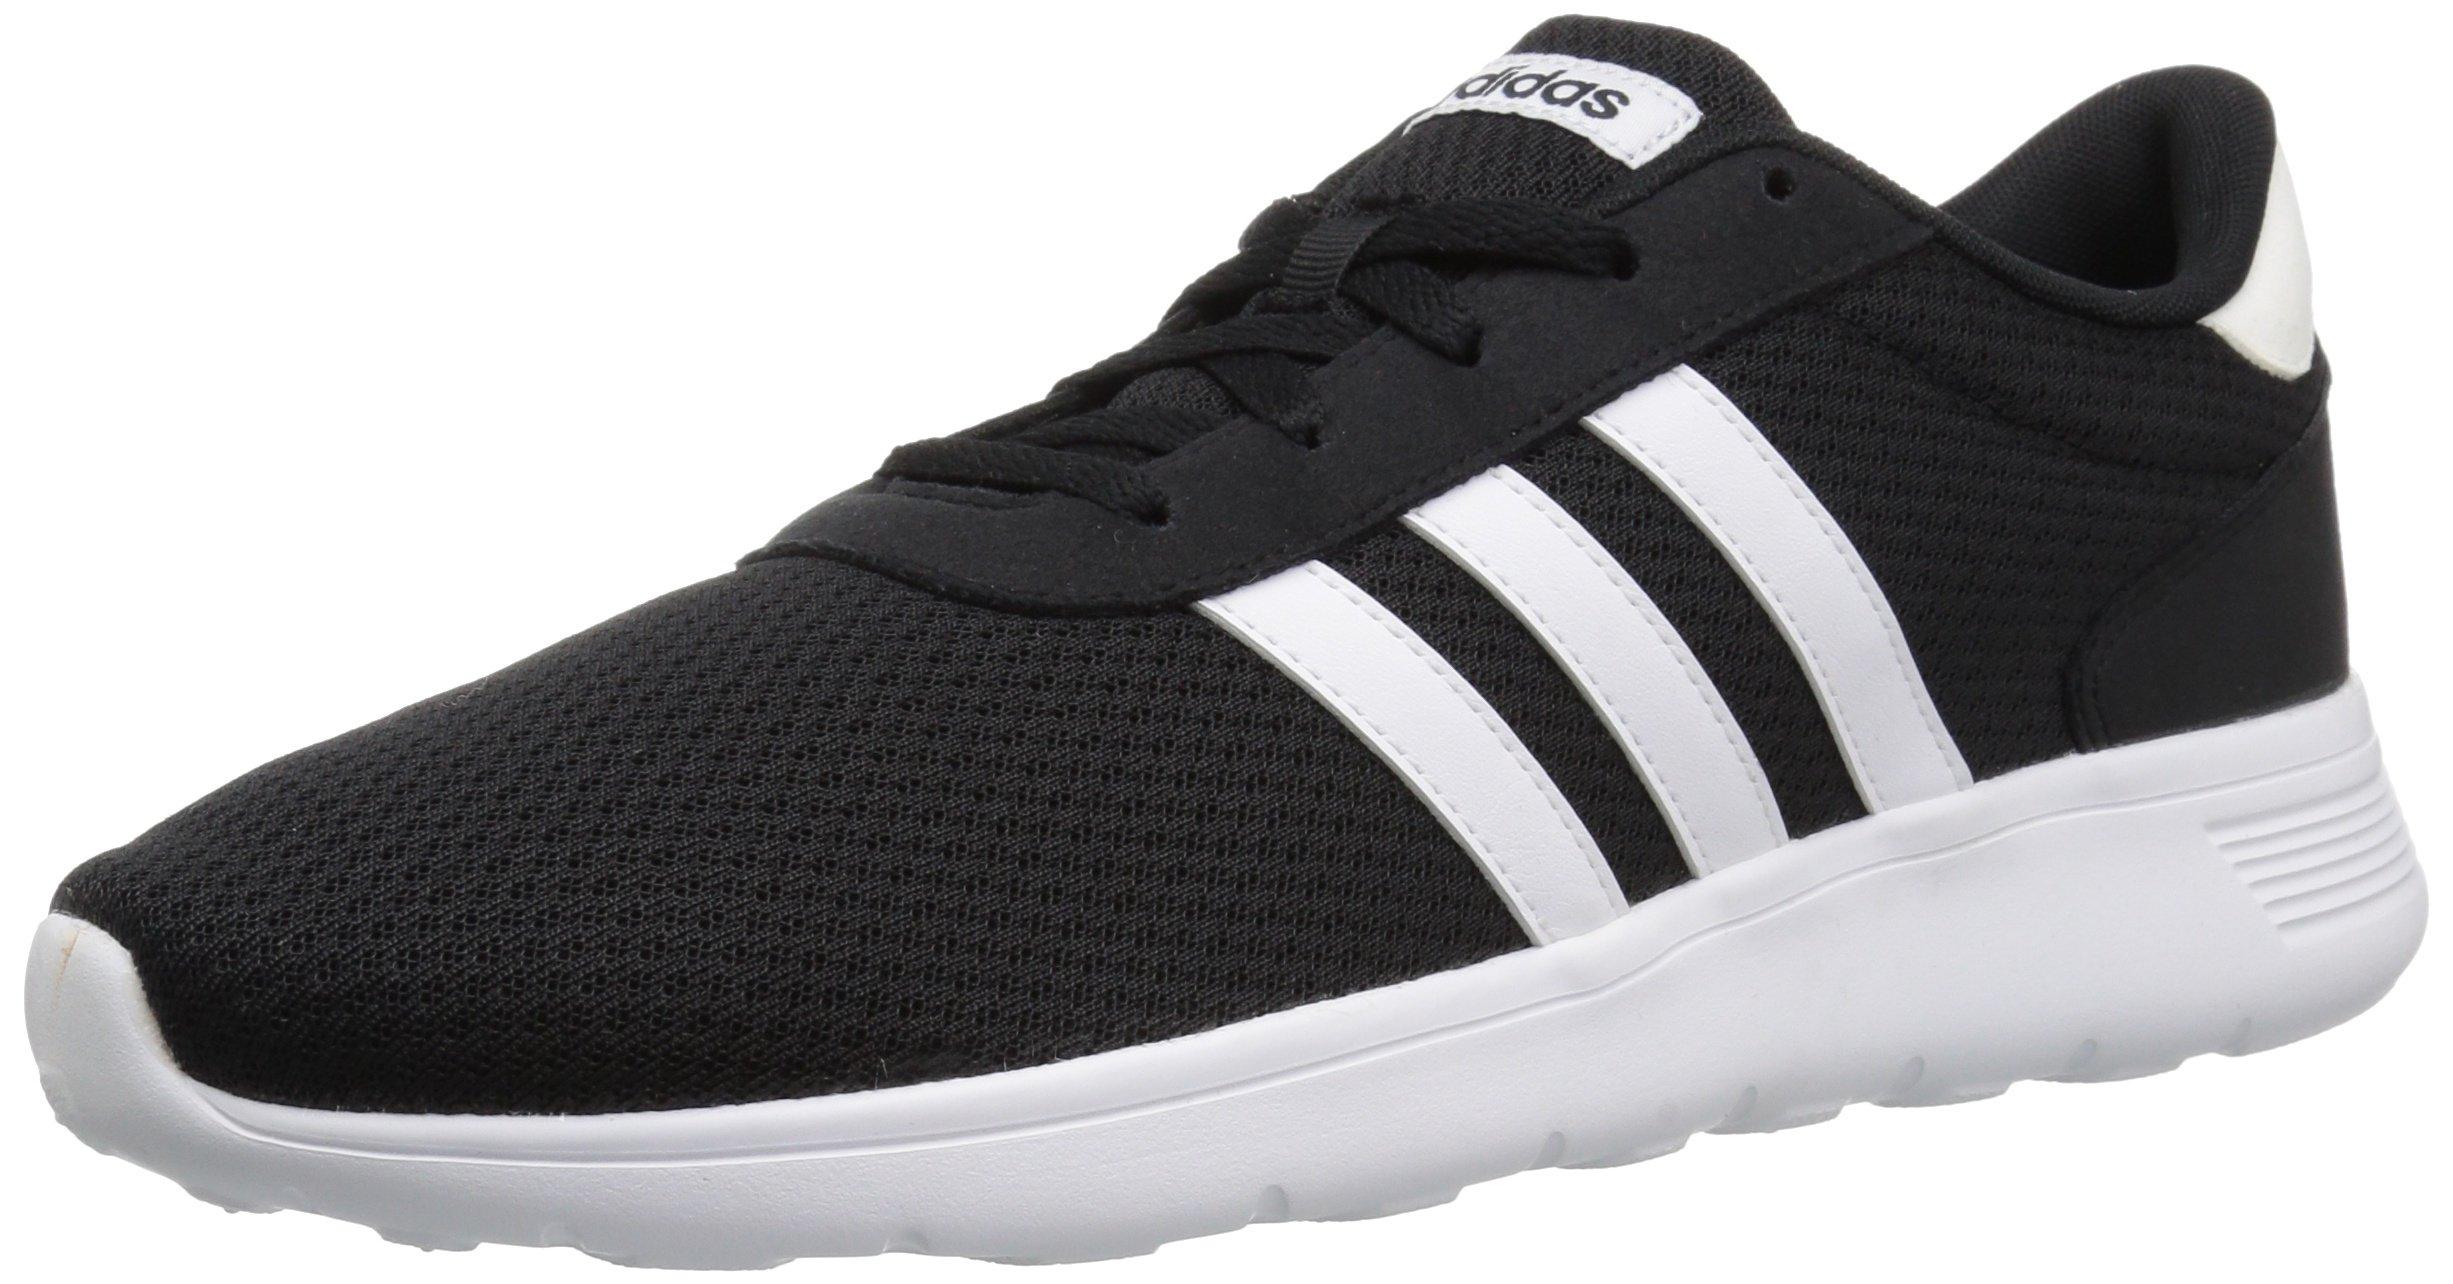 huge selection of 7ce54 8465c Galleon - Adidas Mens Lite Racer Running Shoe, Black White,